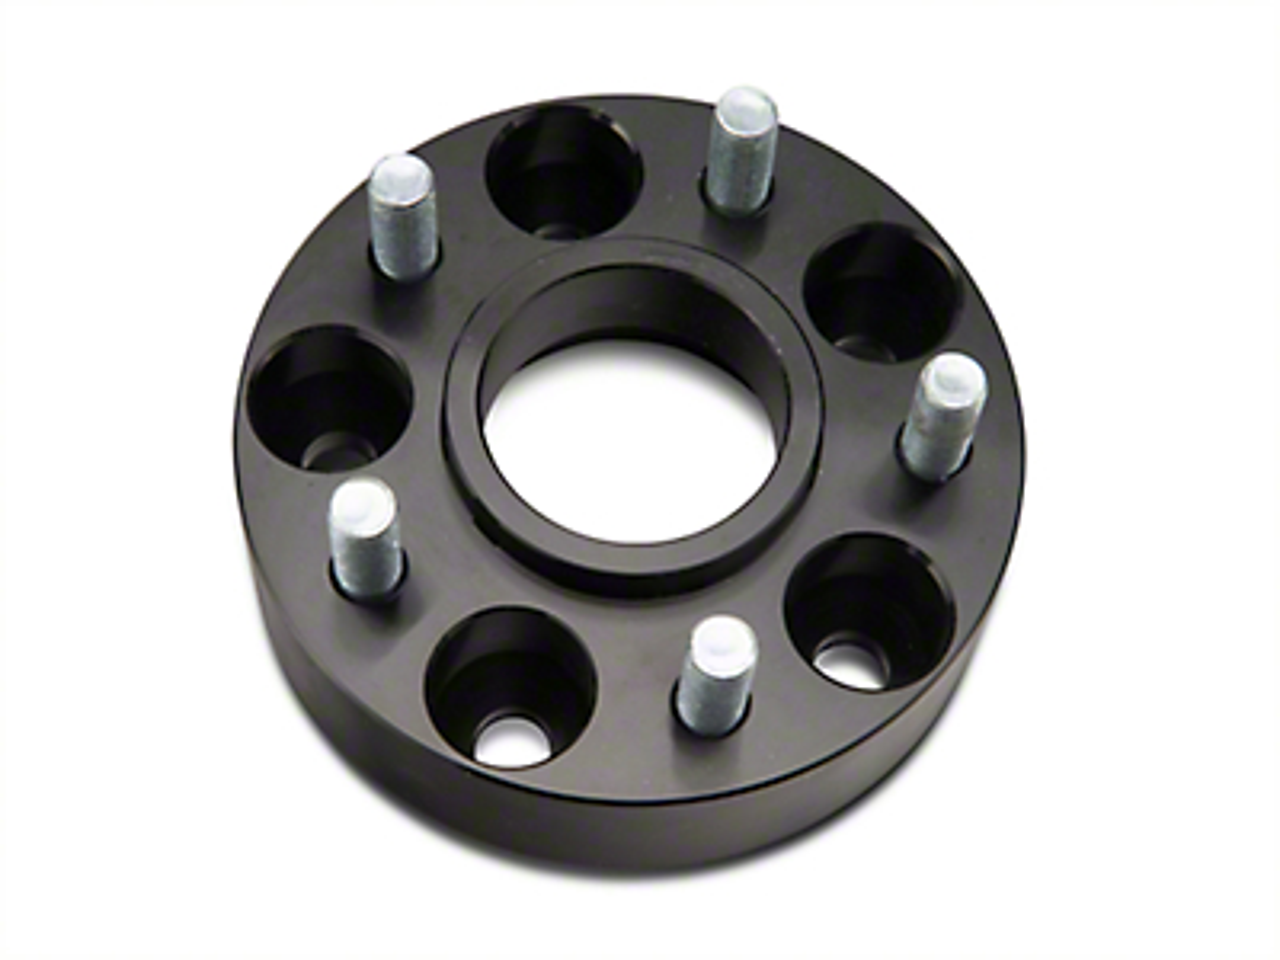 RedRock 4x4 1.5 in. Wheel Spacers - Black - 5x4.5 Bolt Pattern (87-06 Wrangler YJ & TJ)